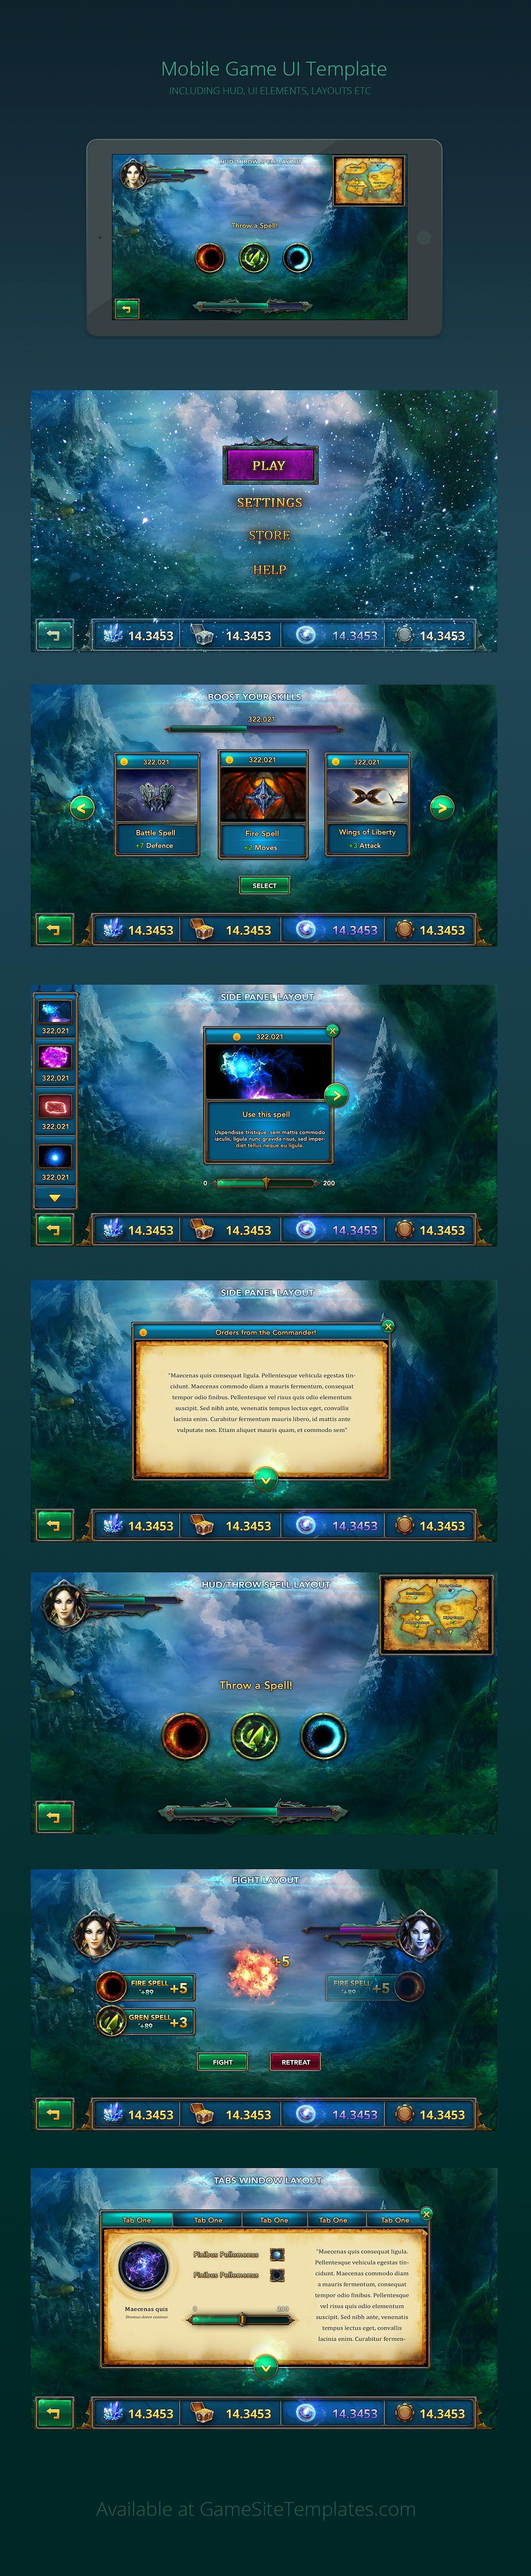 Mobile Game UI Design Templates | codes | Pinterest